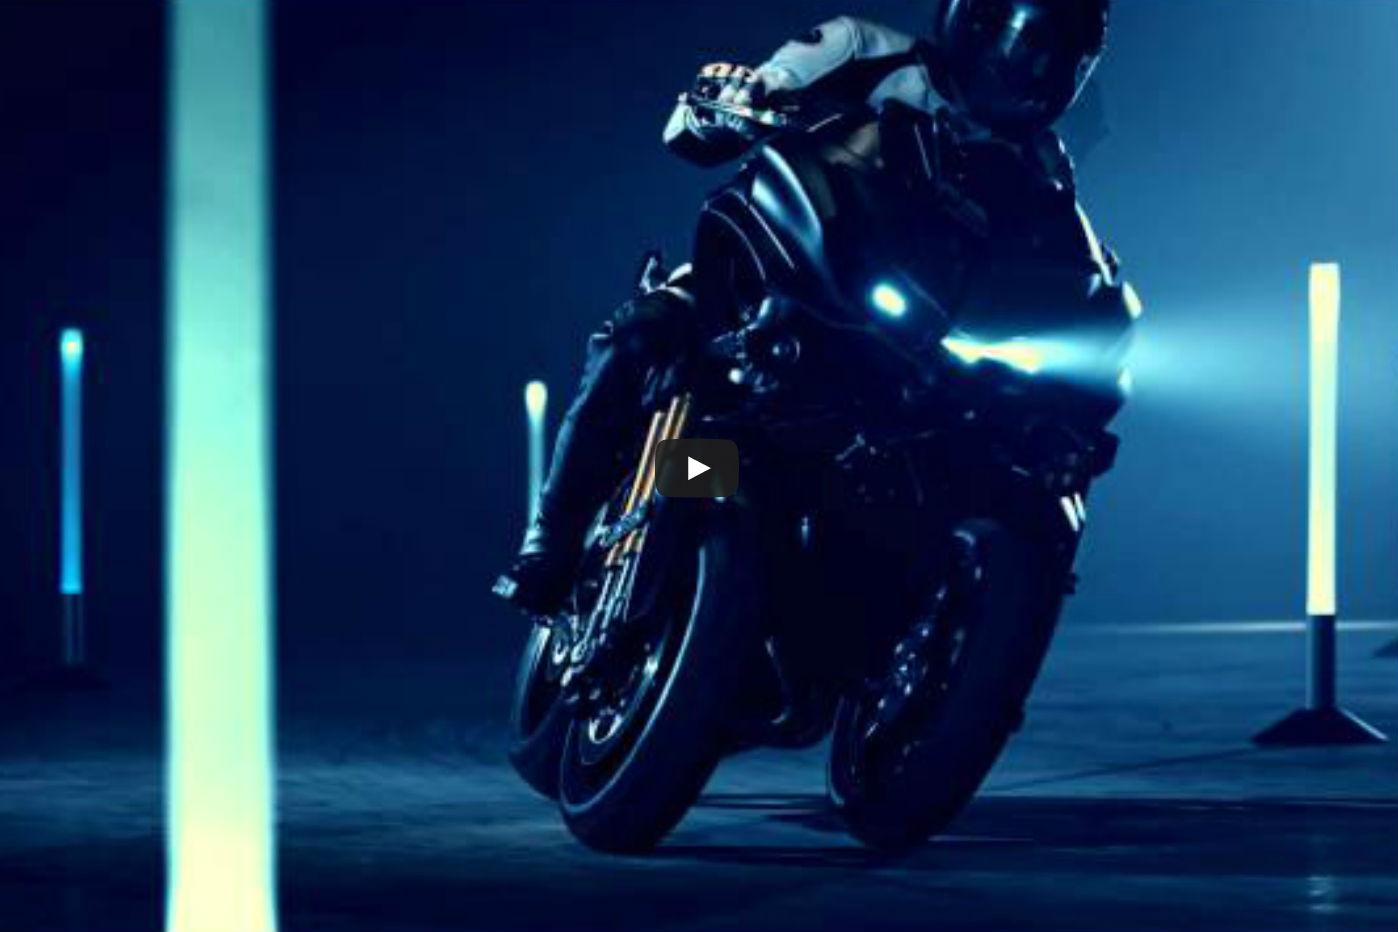 Video: Yamaha's MT-09 three-wheeler in action